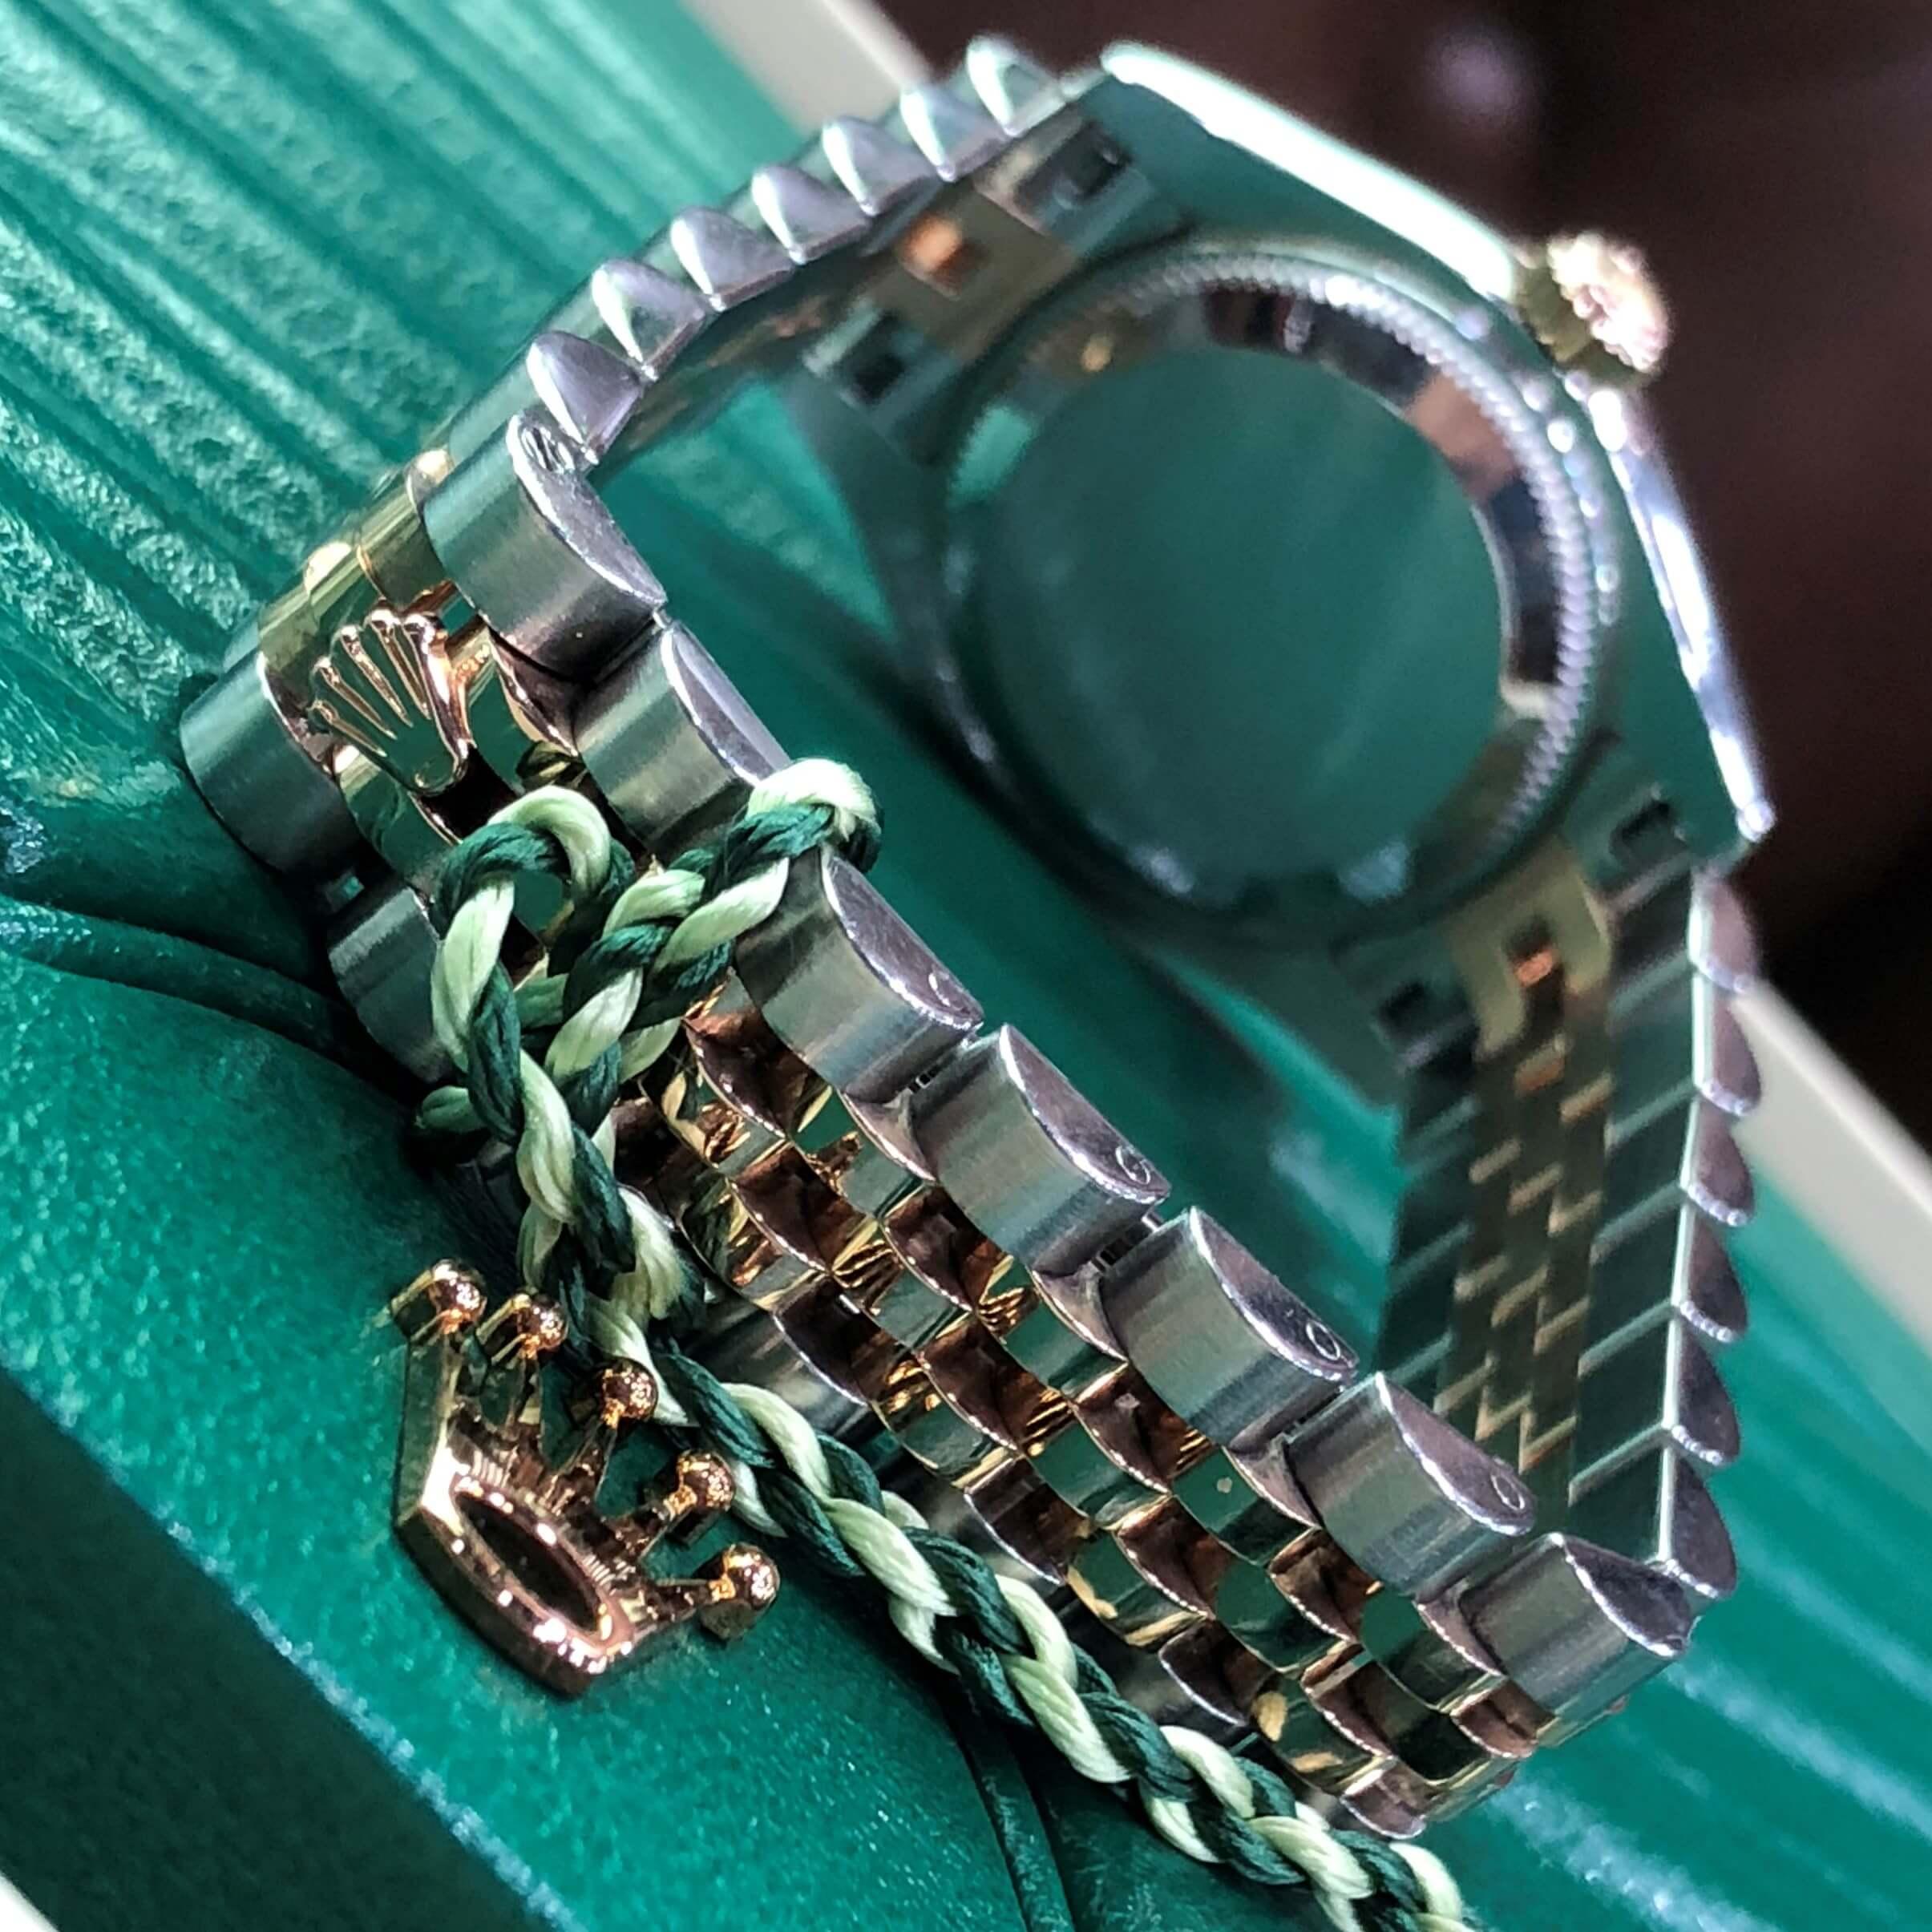 Rolex Lady-Datejust 179171 Mặt ốc trắng Demi vàng hồng 18k